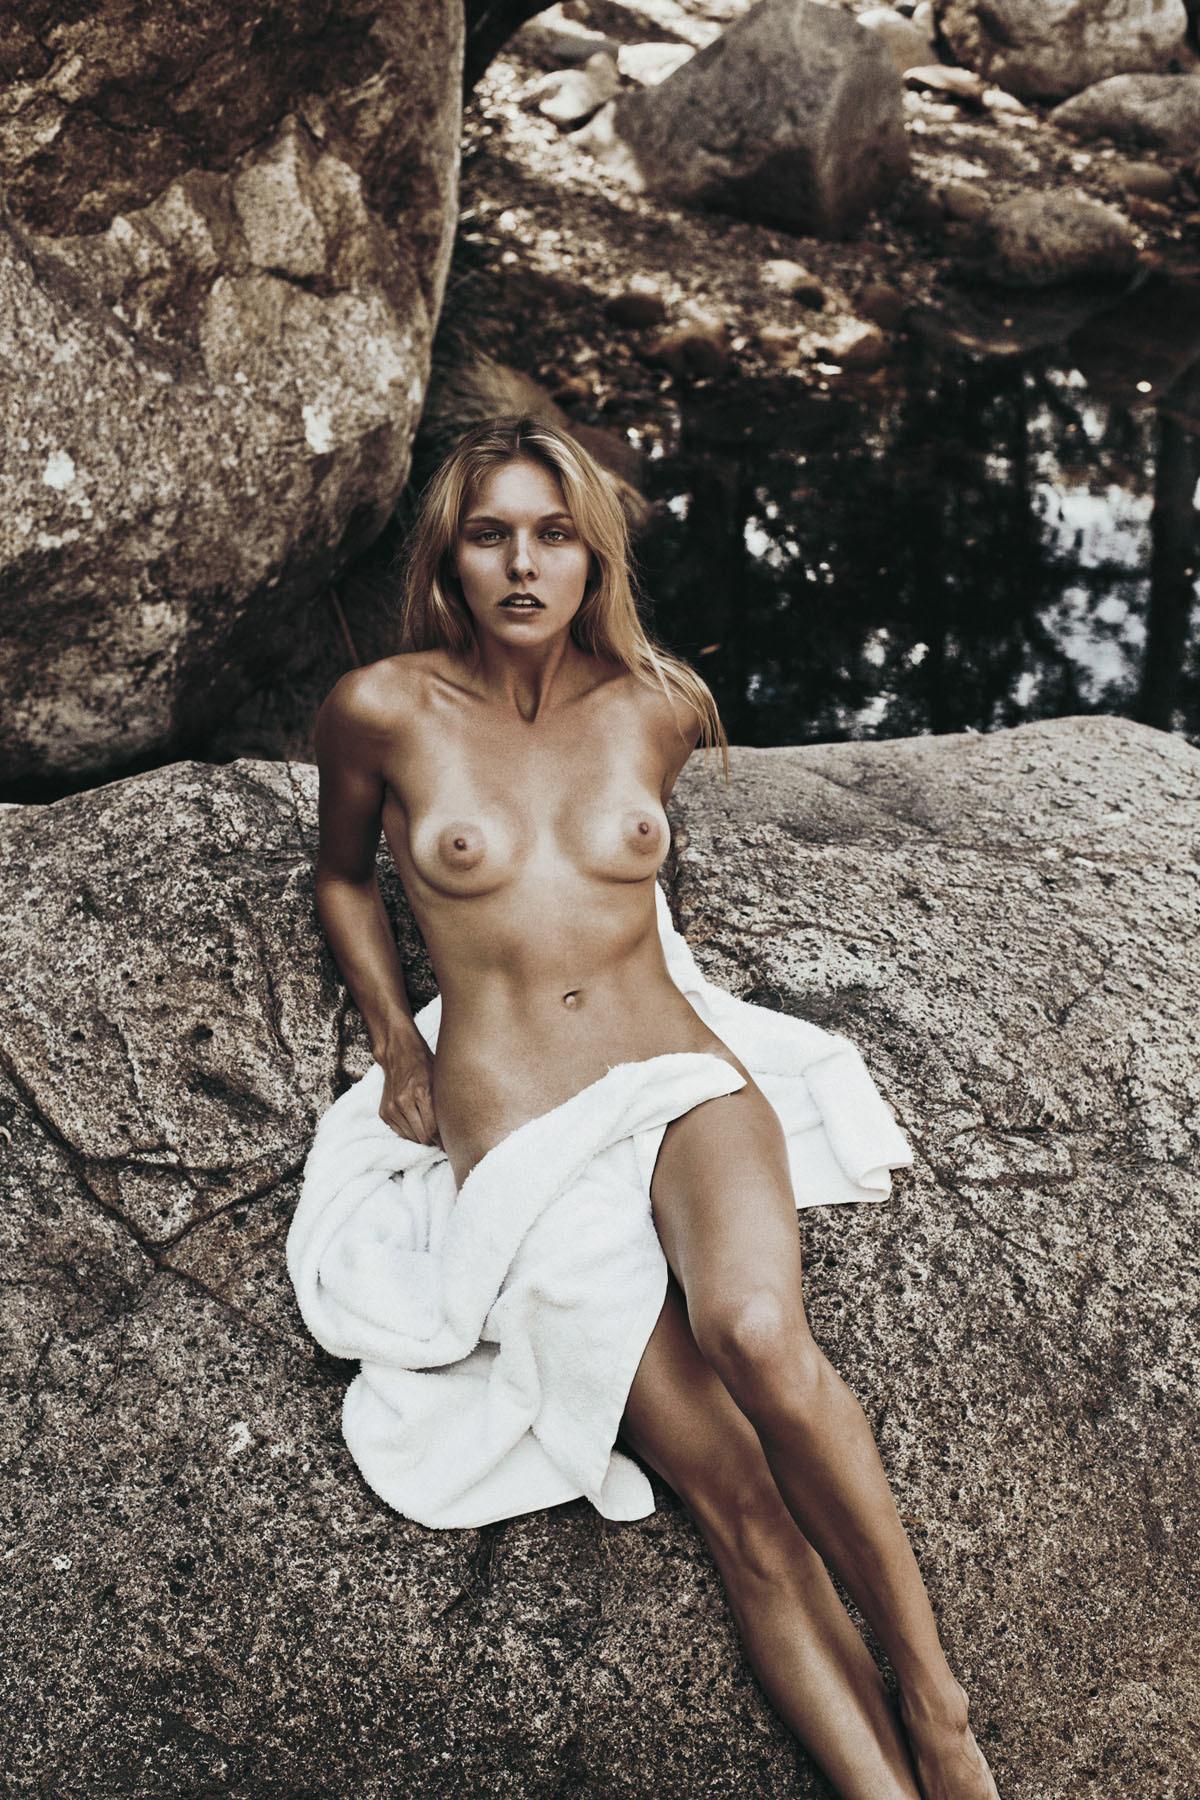 Tina luise nude